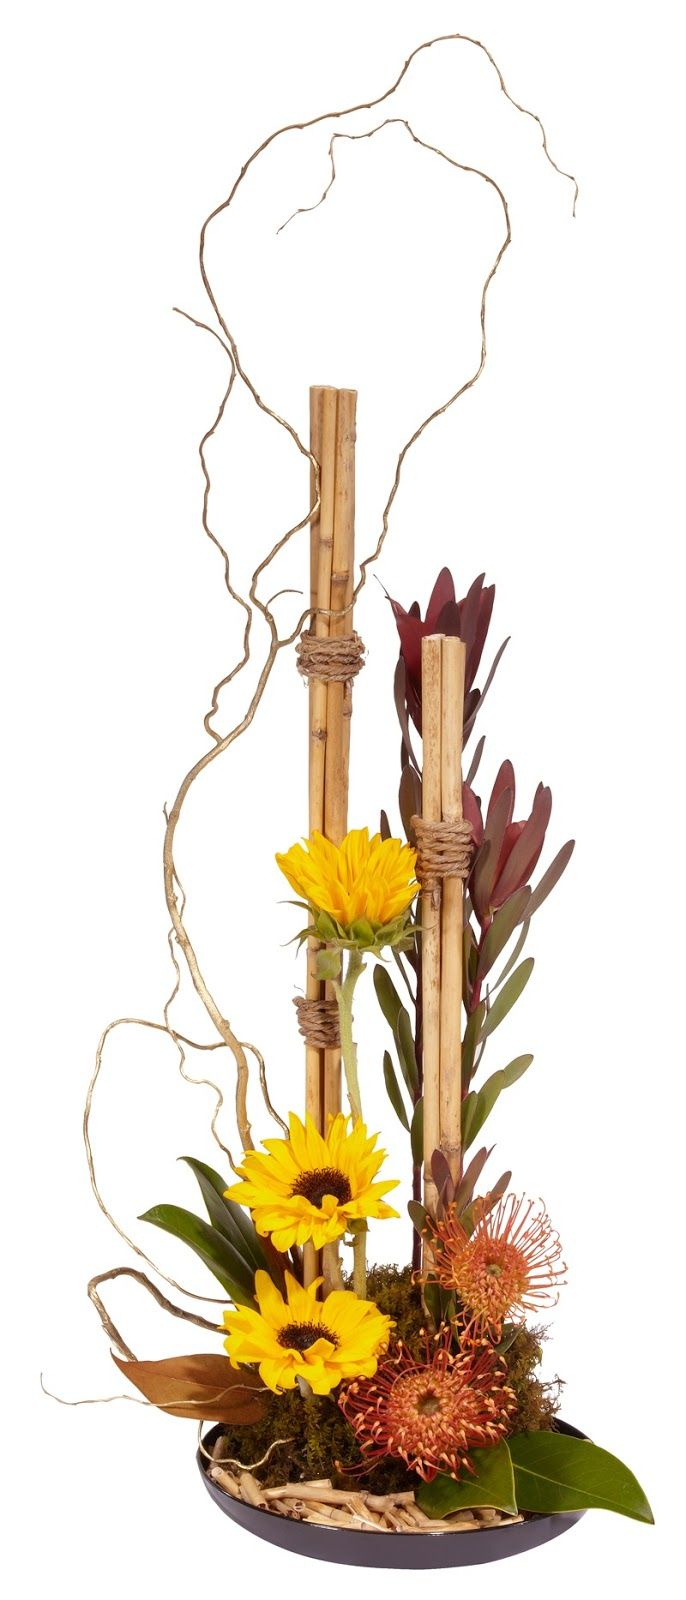 Pin by Judy Swortz on creative floral | Pinterest | Floral designs Club Creative Design Gardens on creative books, creative landscape architect, creative container gardens, creative pool landscape, creative trees, creative vertical gardens, creative herb gardens, creative rock gardens,